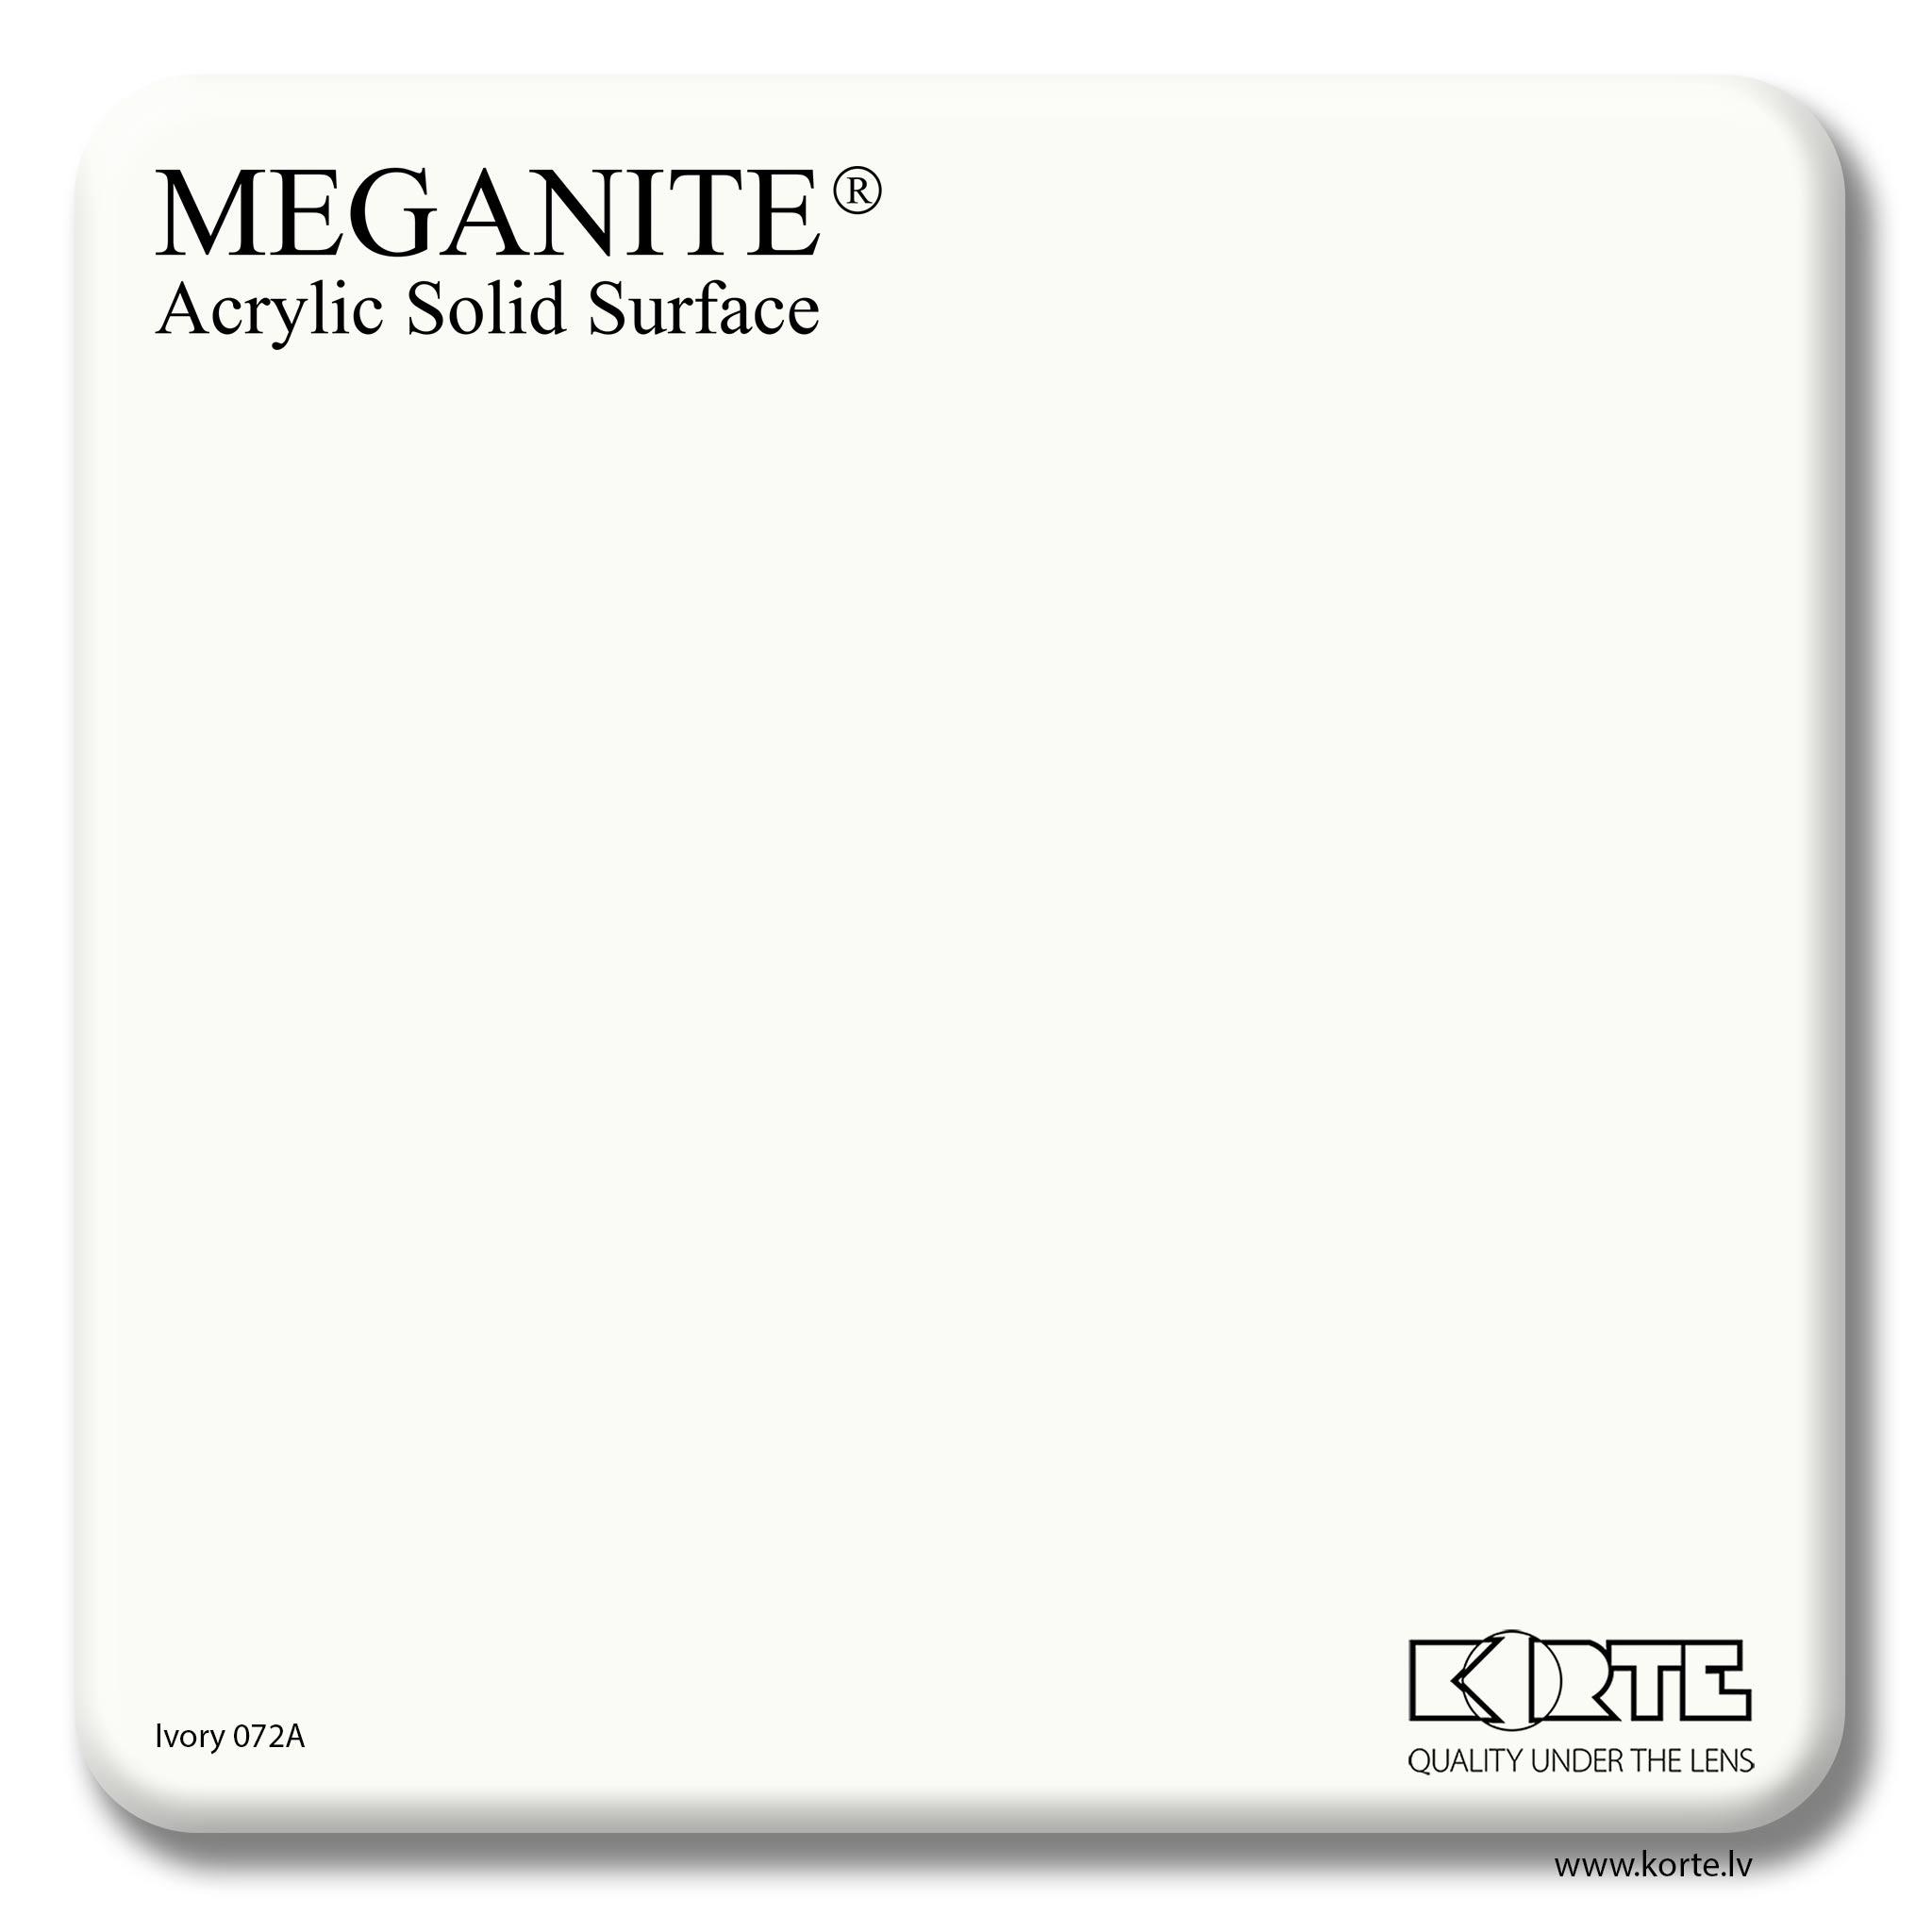 Meganite Ivory 072A